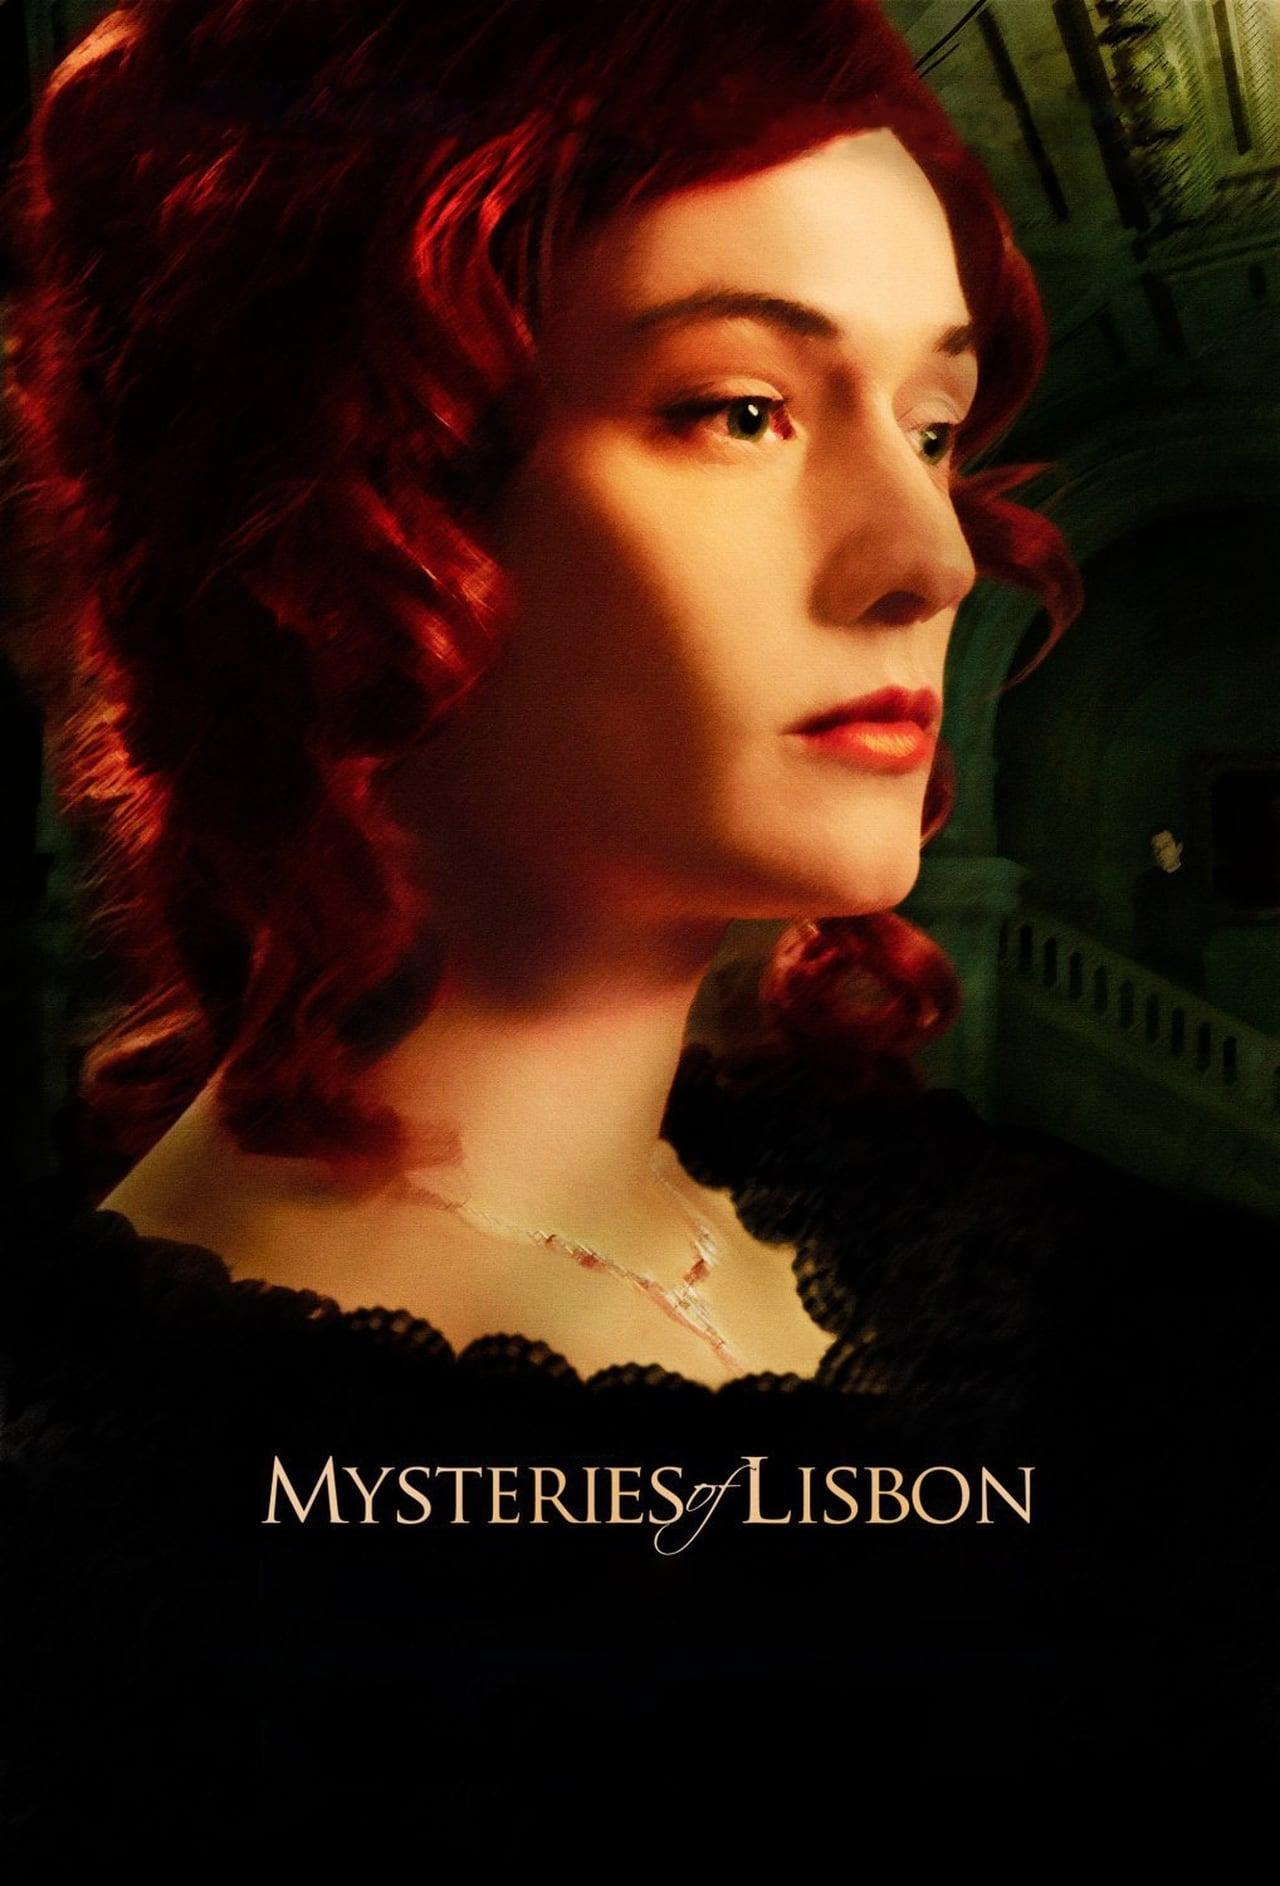 Mysteries Of Lisbon (2011)